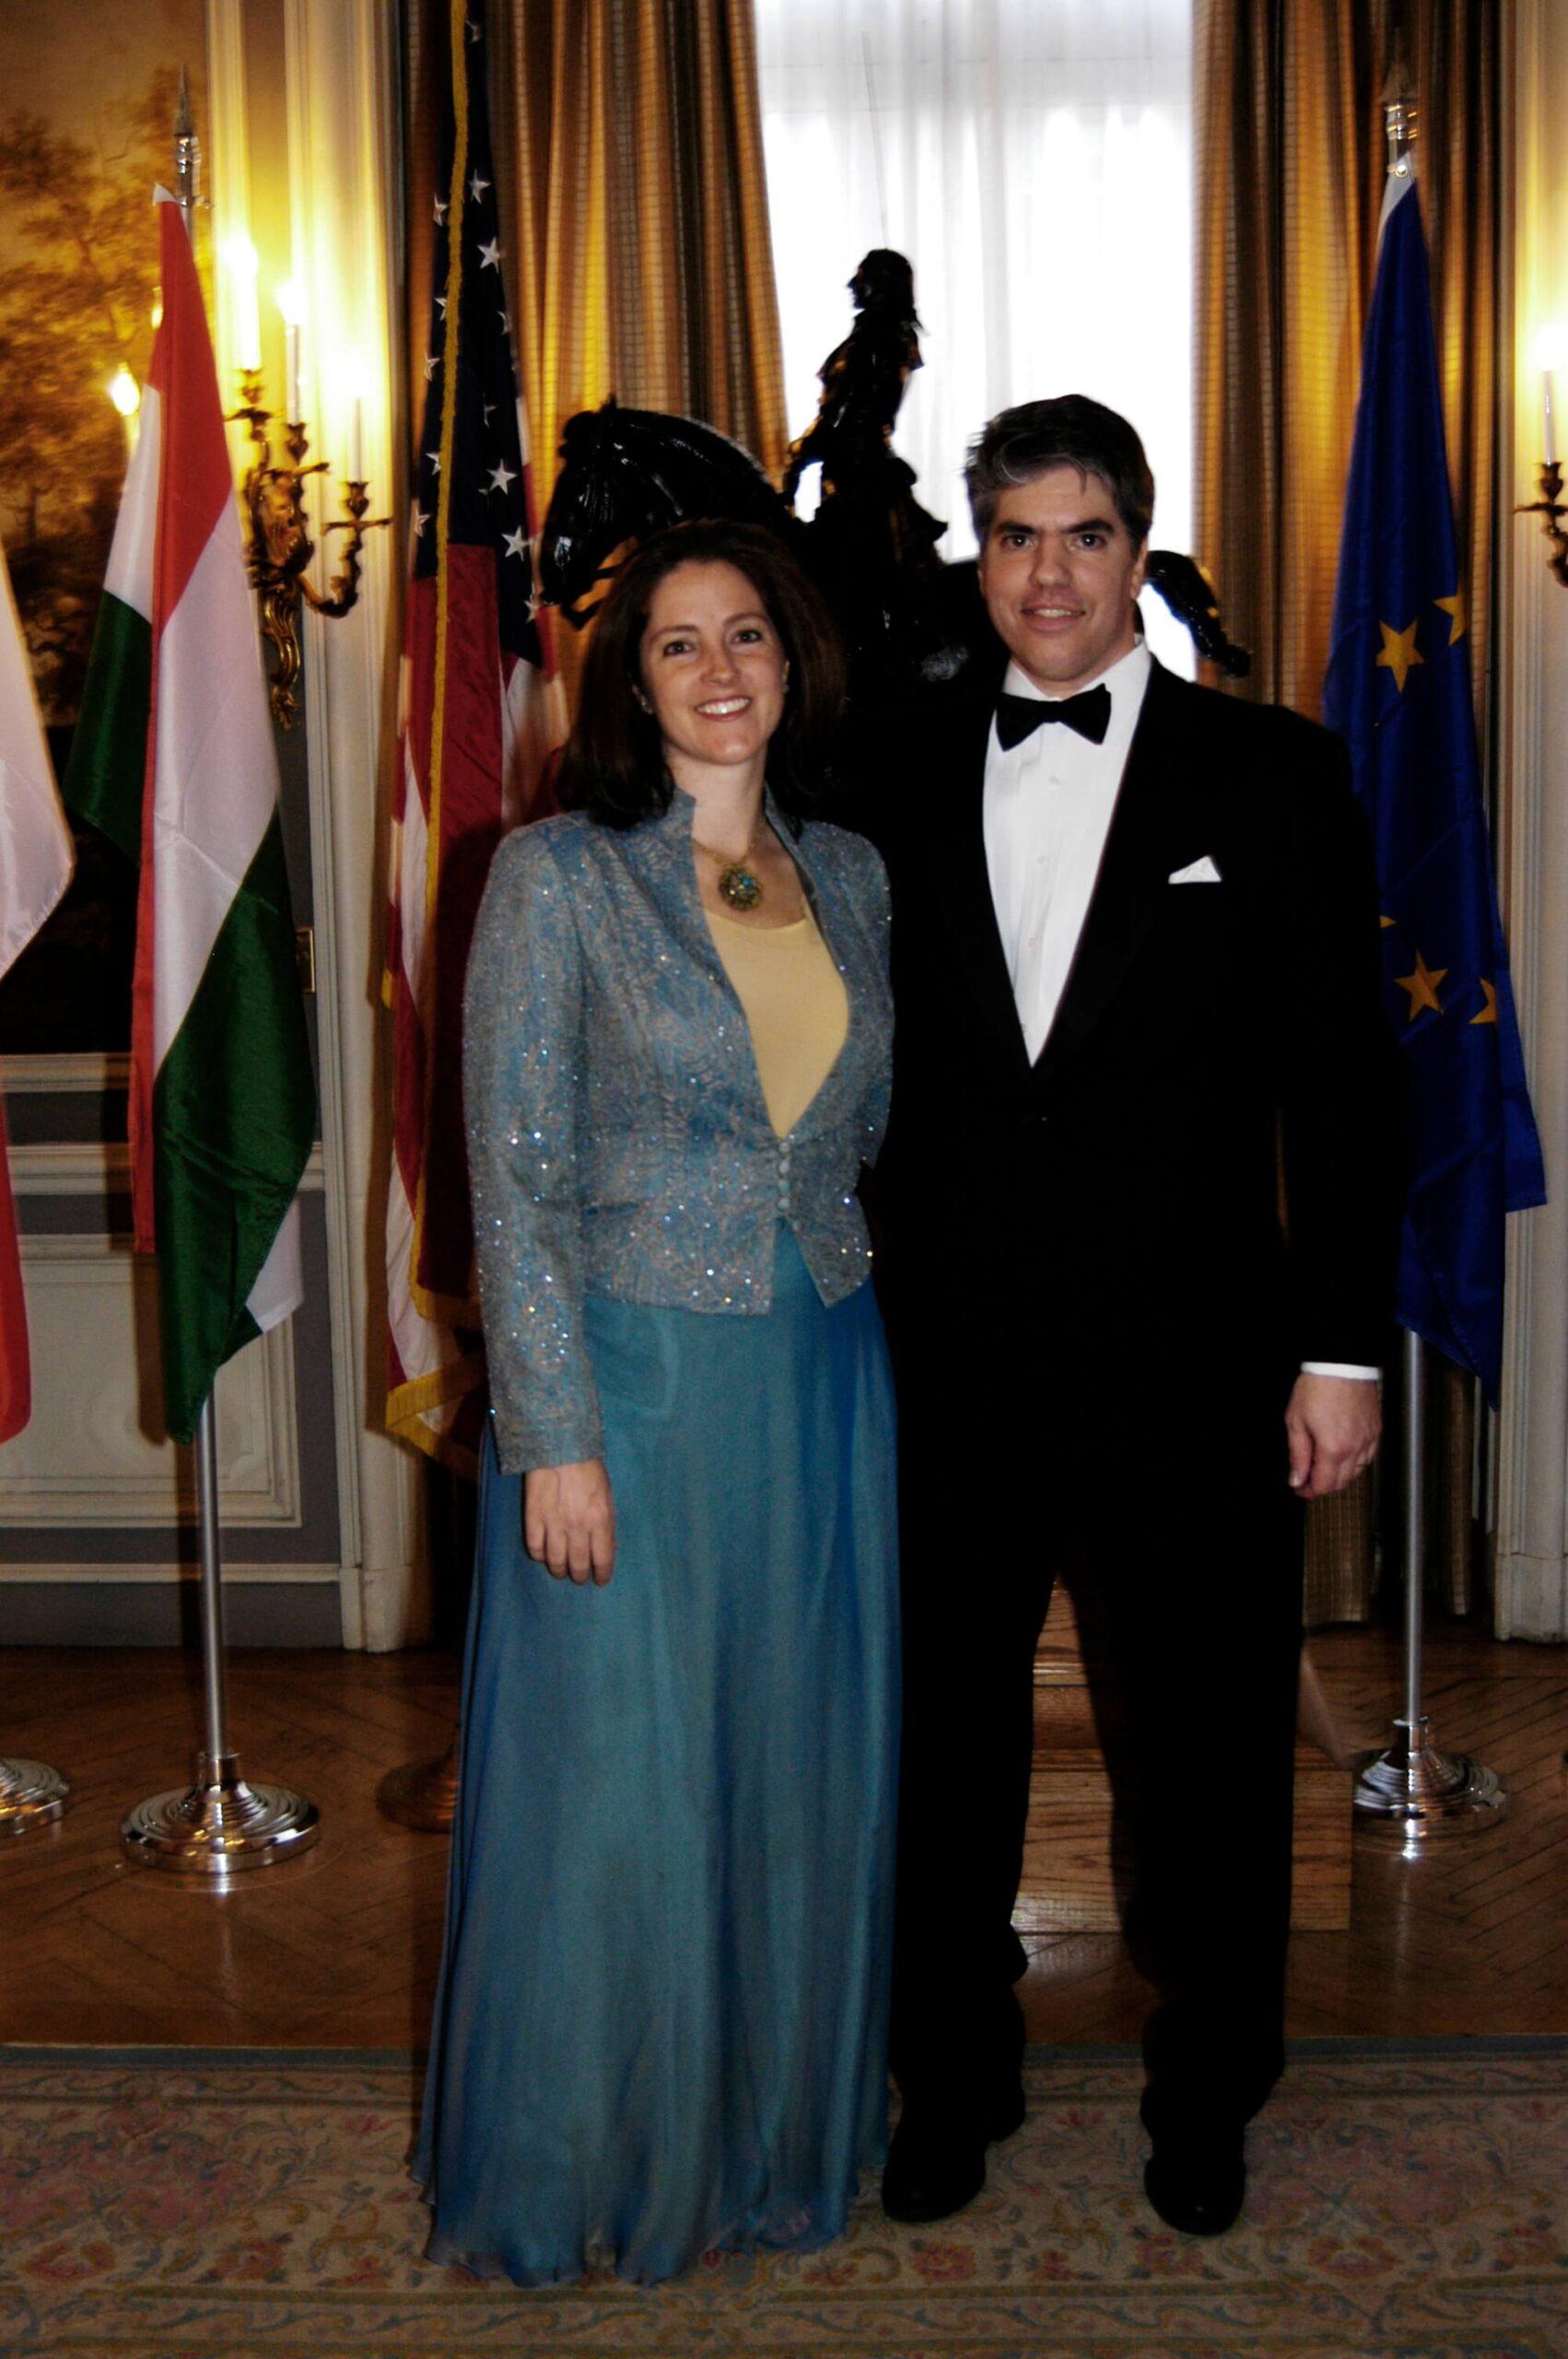 Mr. & Mrs. Maximilian and Wendy Teleki